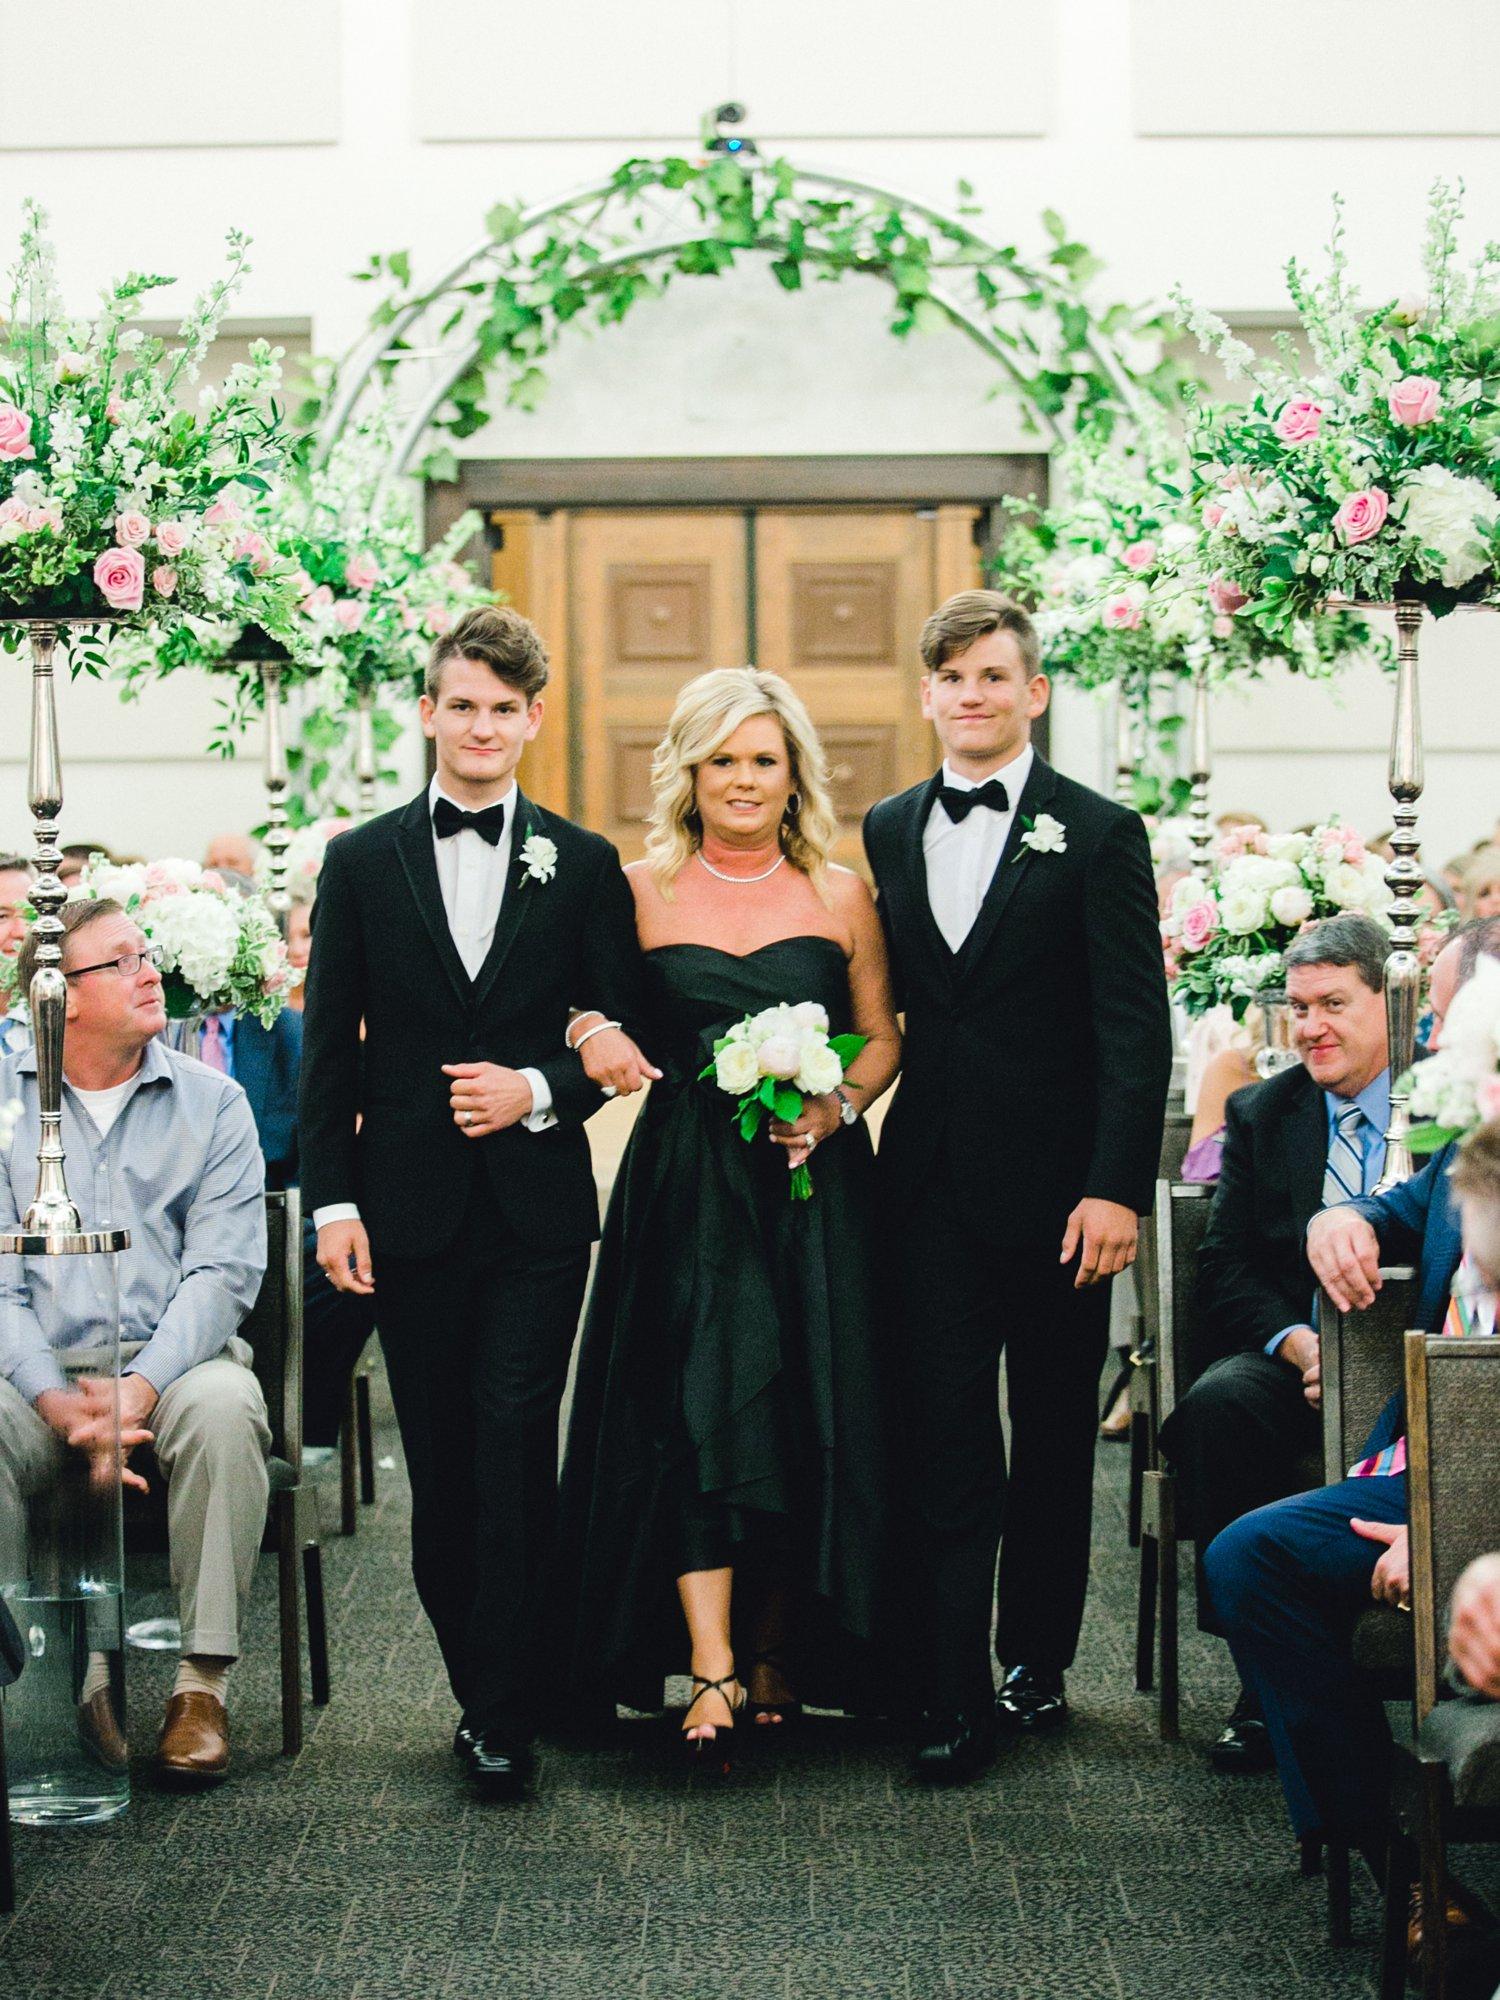 Taylor-and-Brock-Williams-Texas-Tech-University-Merket-Alumni-Center-Lubbock-Photographer-ALLEEJ0112.jpg